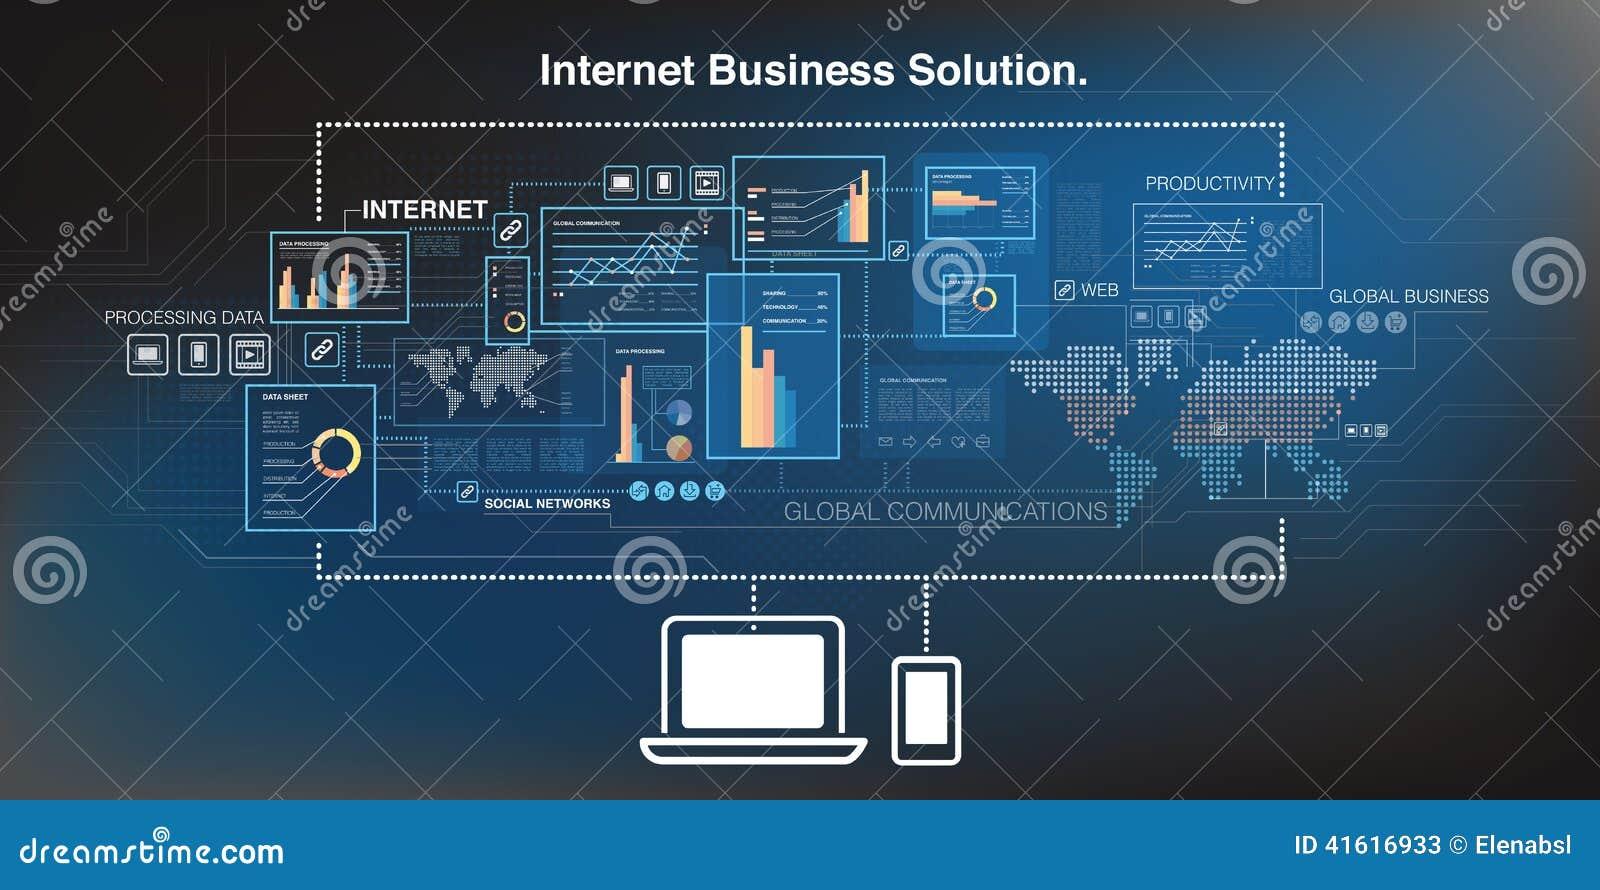 Technology Background Laptop: Online Business Background Stock Vector. Illustration Of